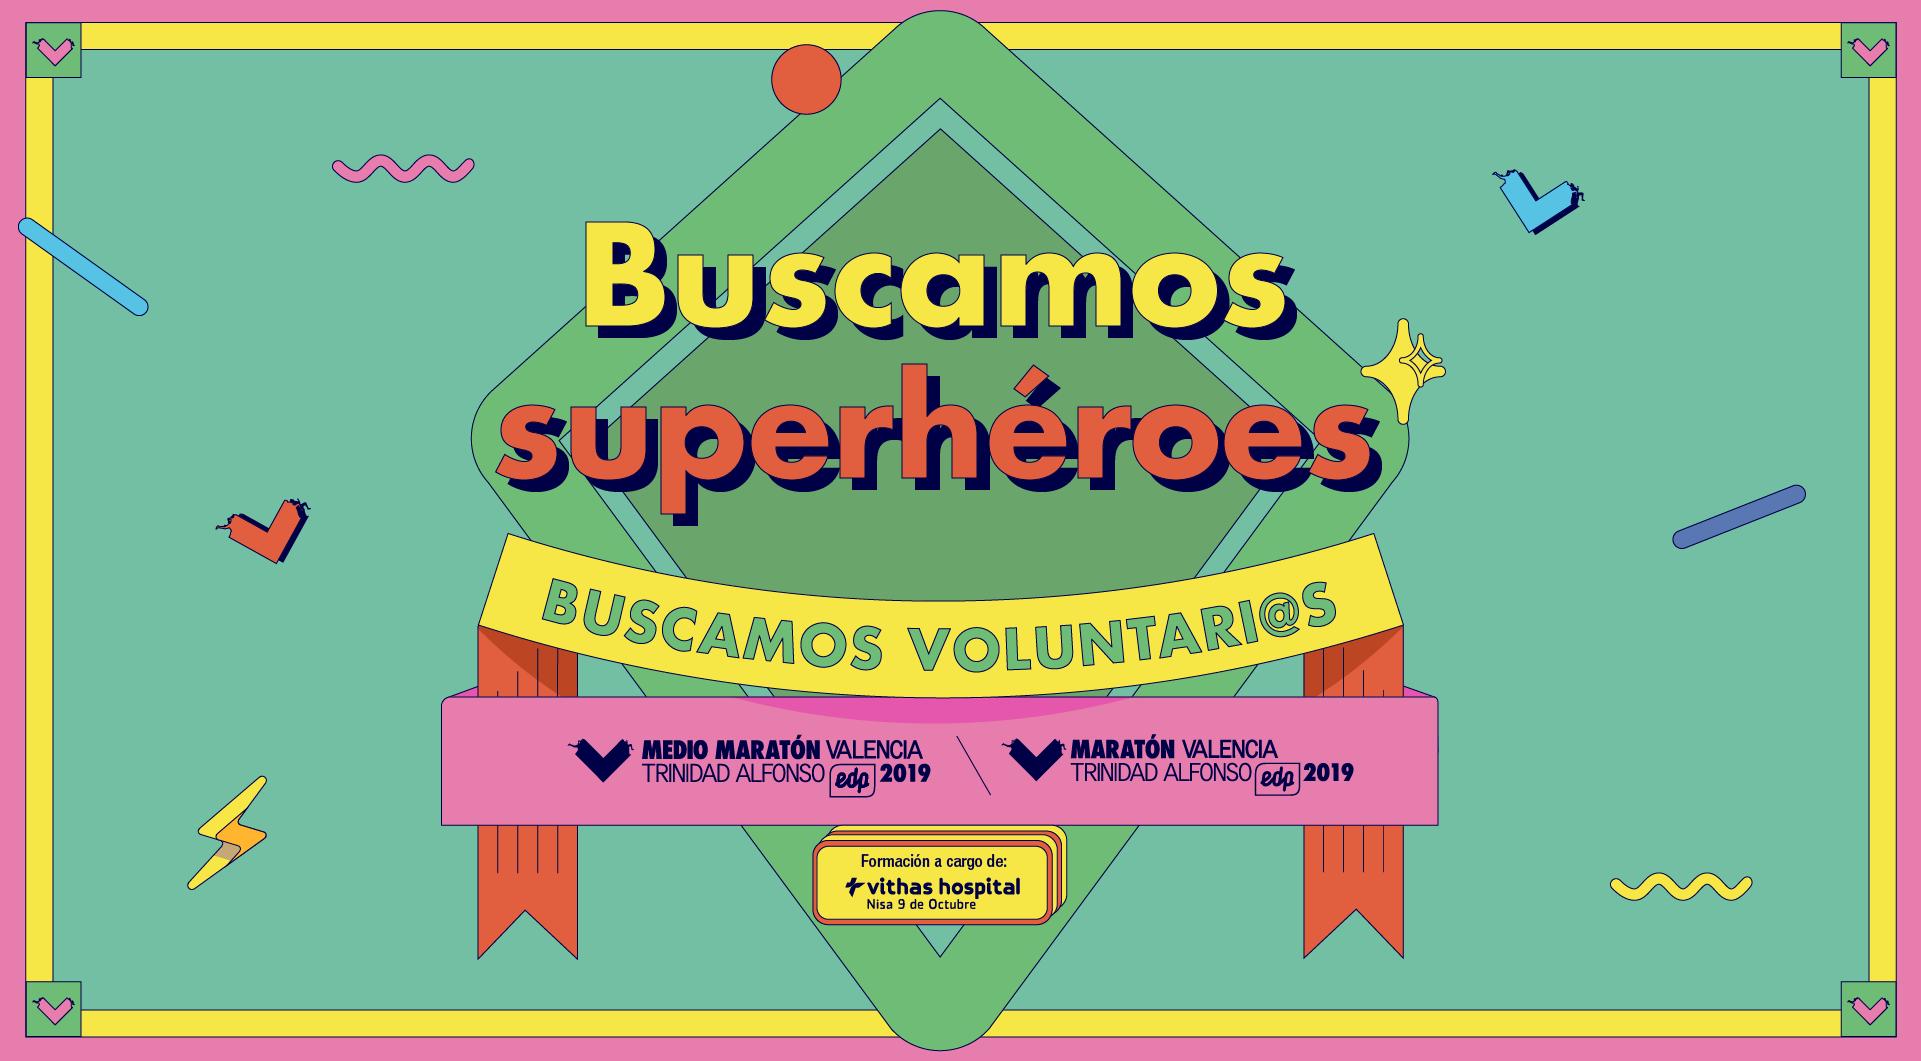 Buscamos superhéroes - Buscamos voluntarios